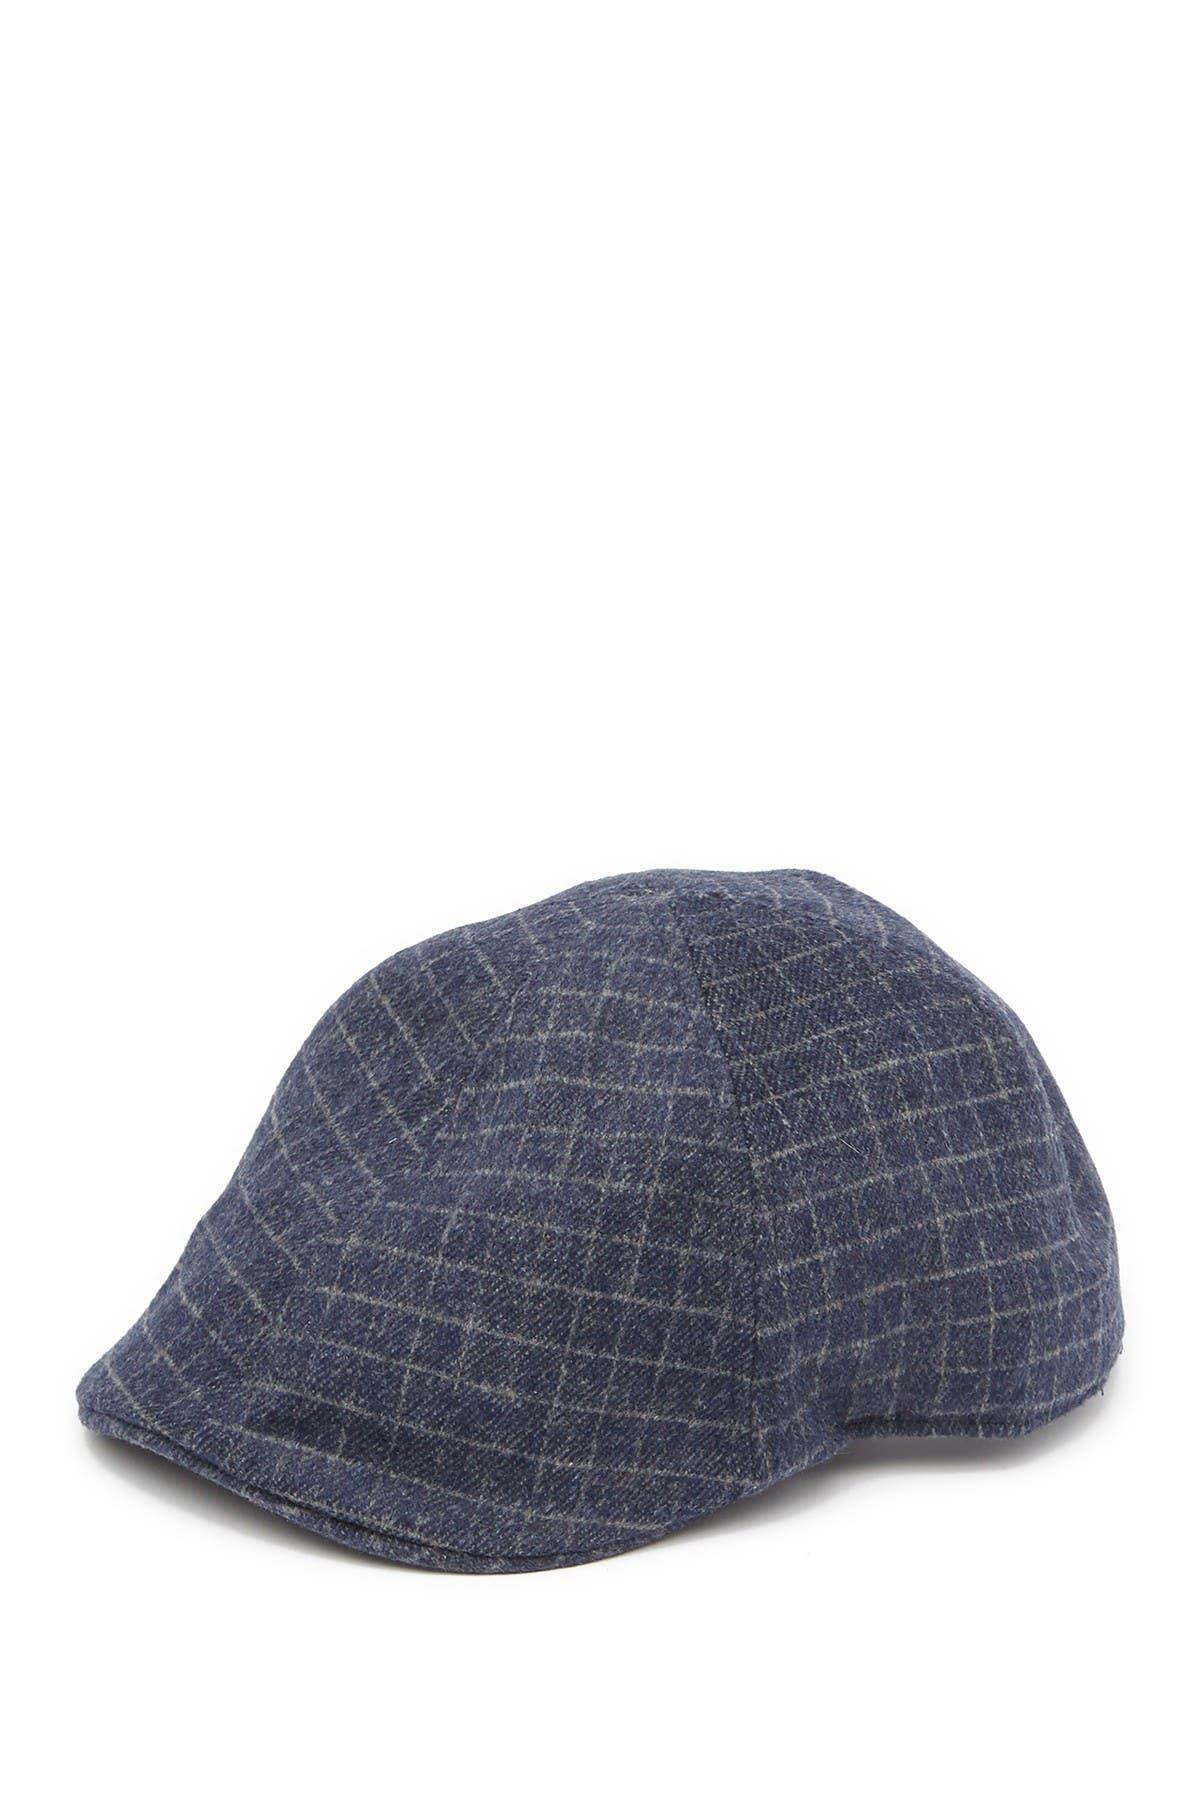 Image of SAN DIEGO HAT Plaid Flannel News Boy Cap